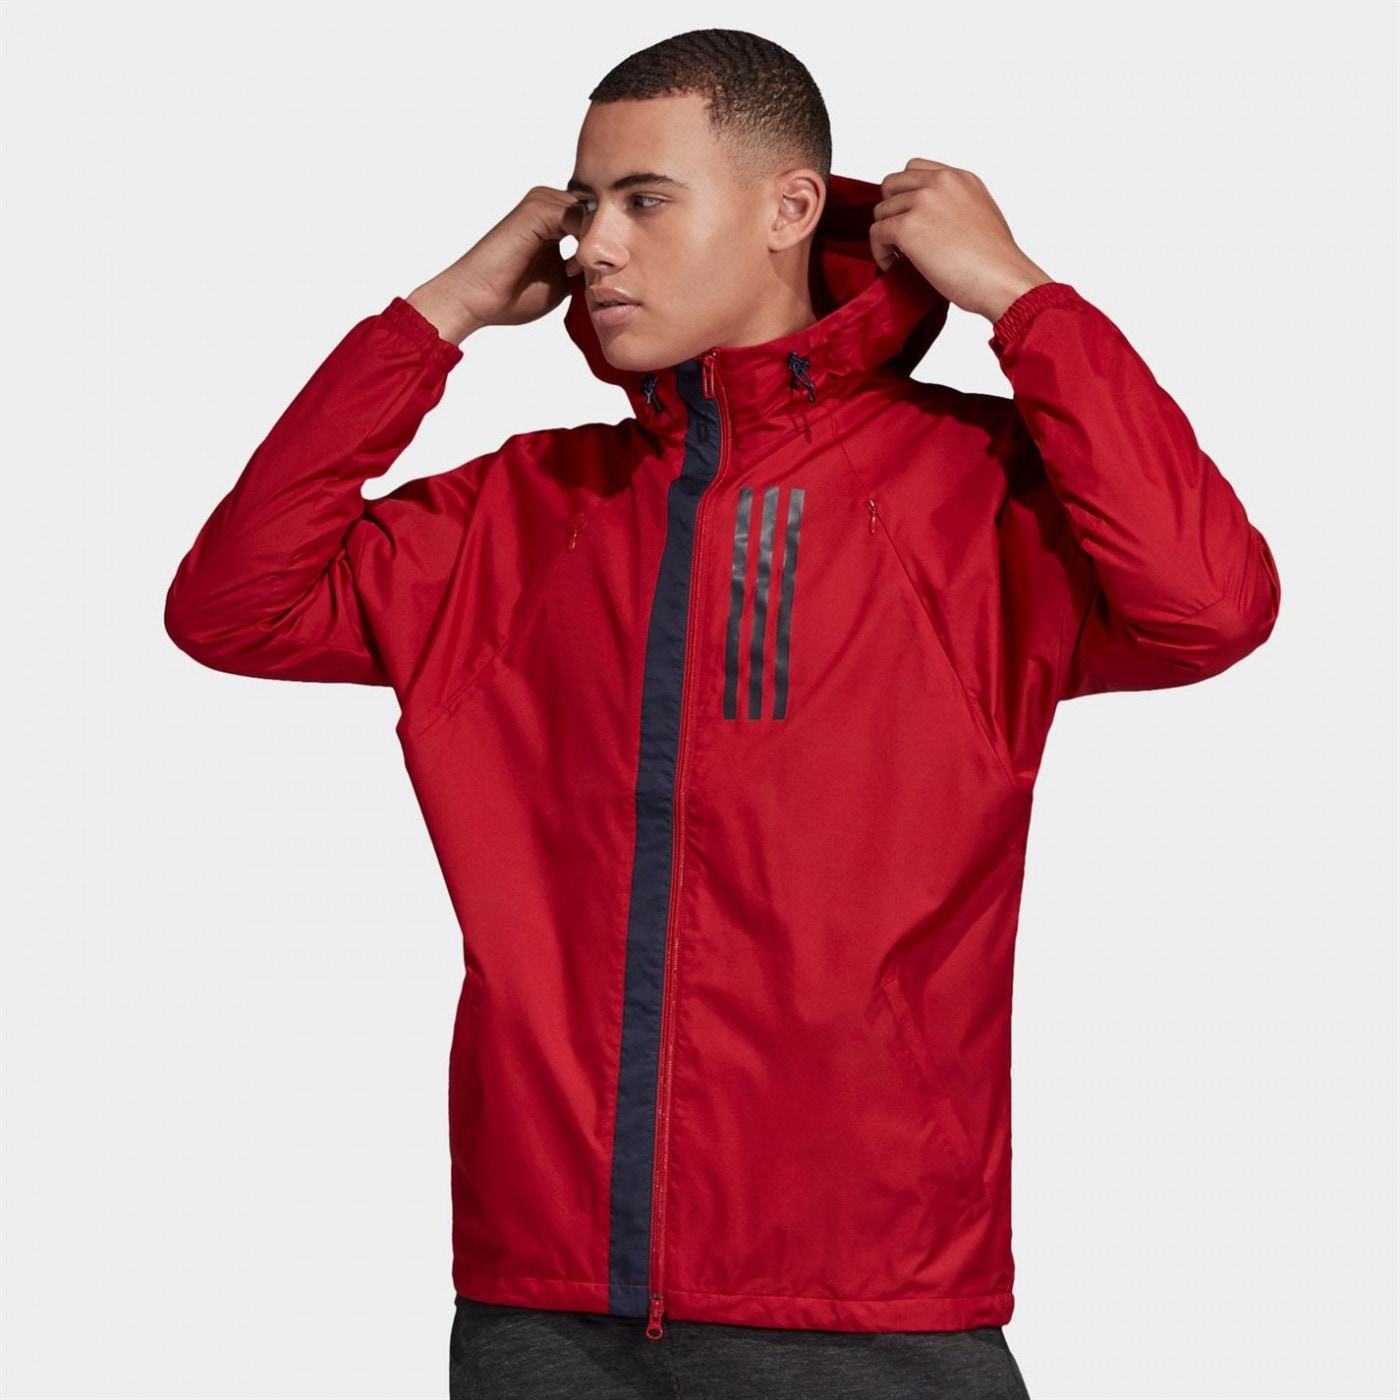 Adidas WND Full Track Jacket Mens